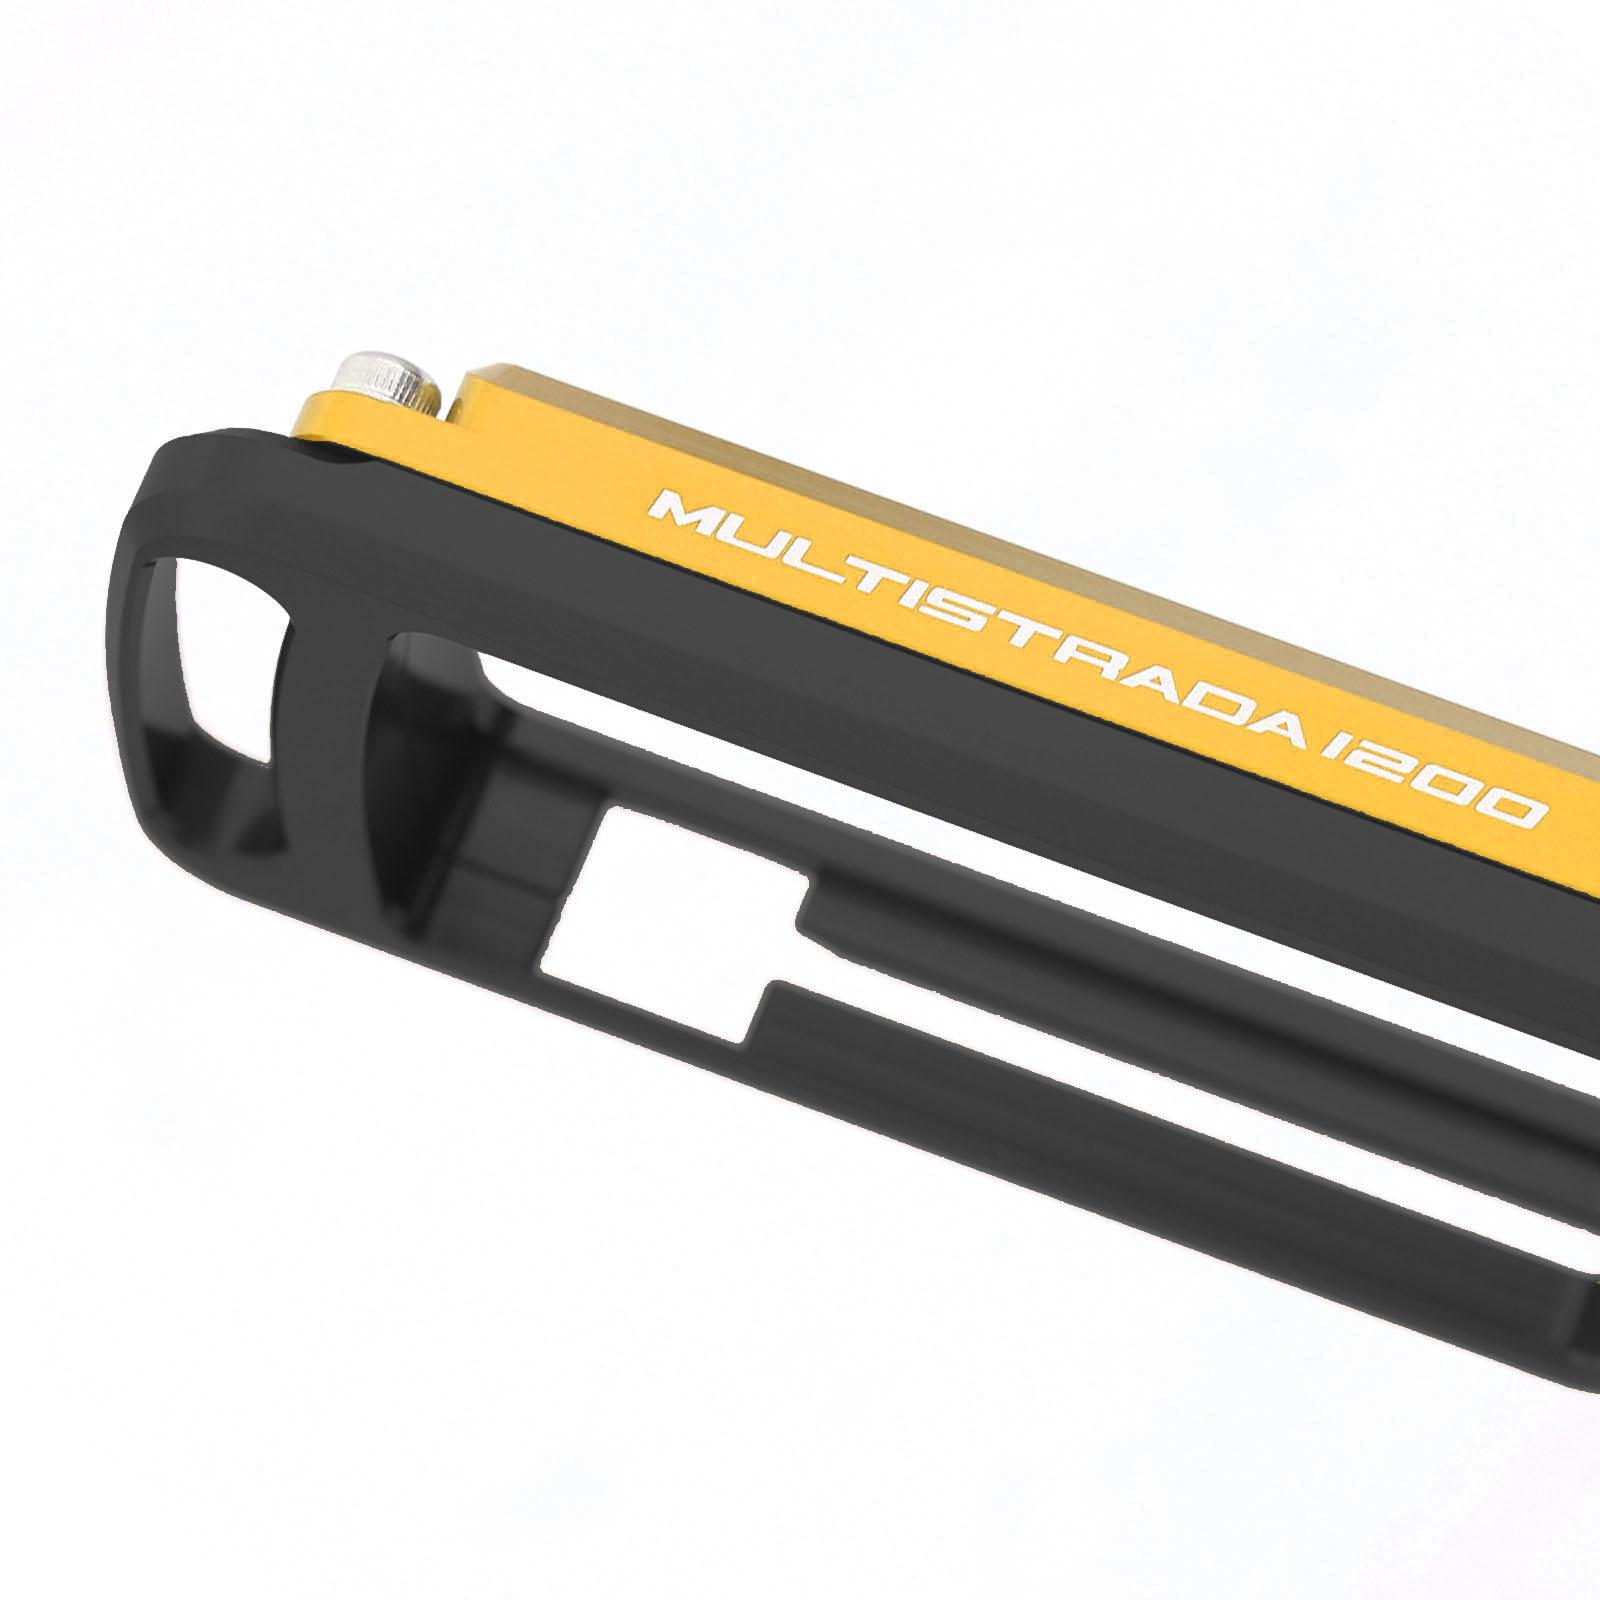 Ducati Multistrada 1200 S Black Gold Red Motorcycle Key Case Holder